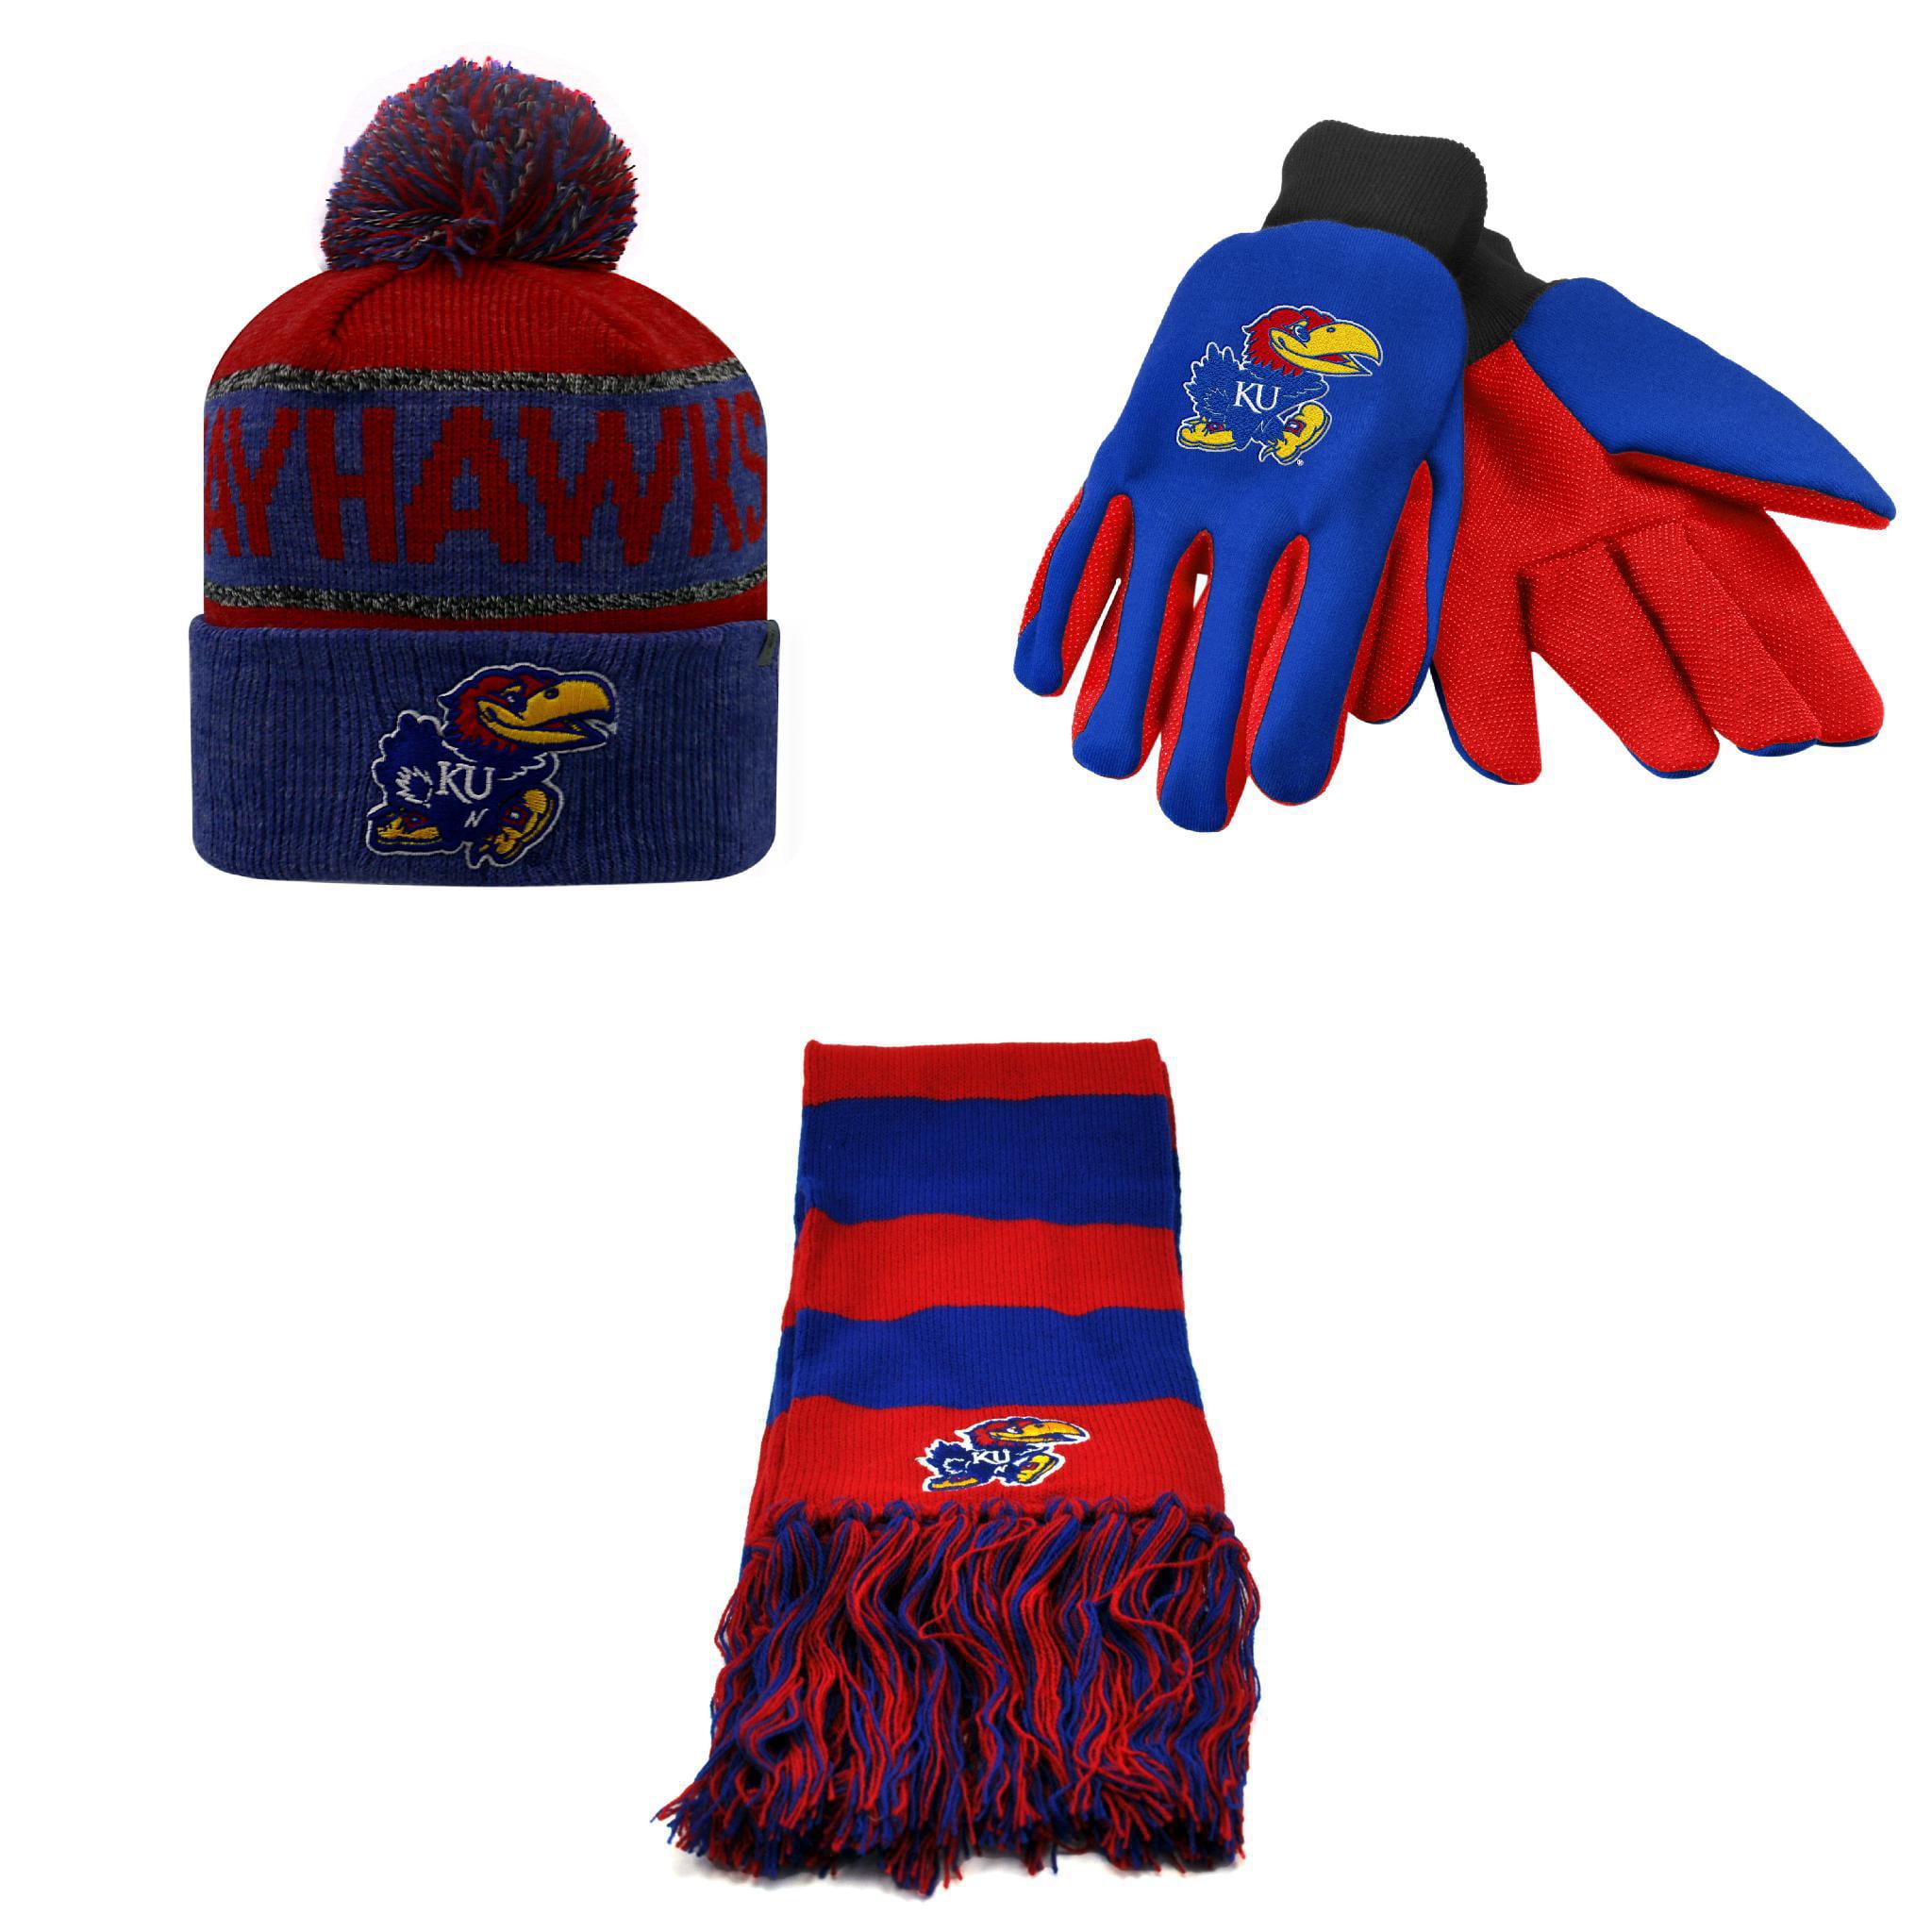 NCAA  Work Glove Colored Belowzero Beanie Hat And Stripe Scarf 3 Pack Bundle